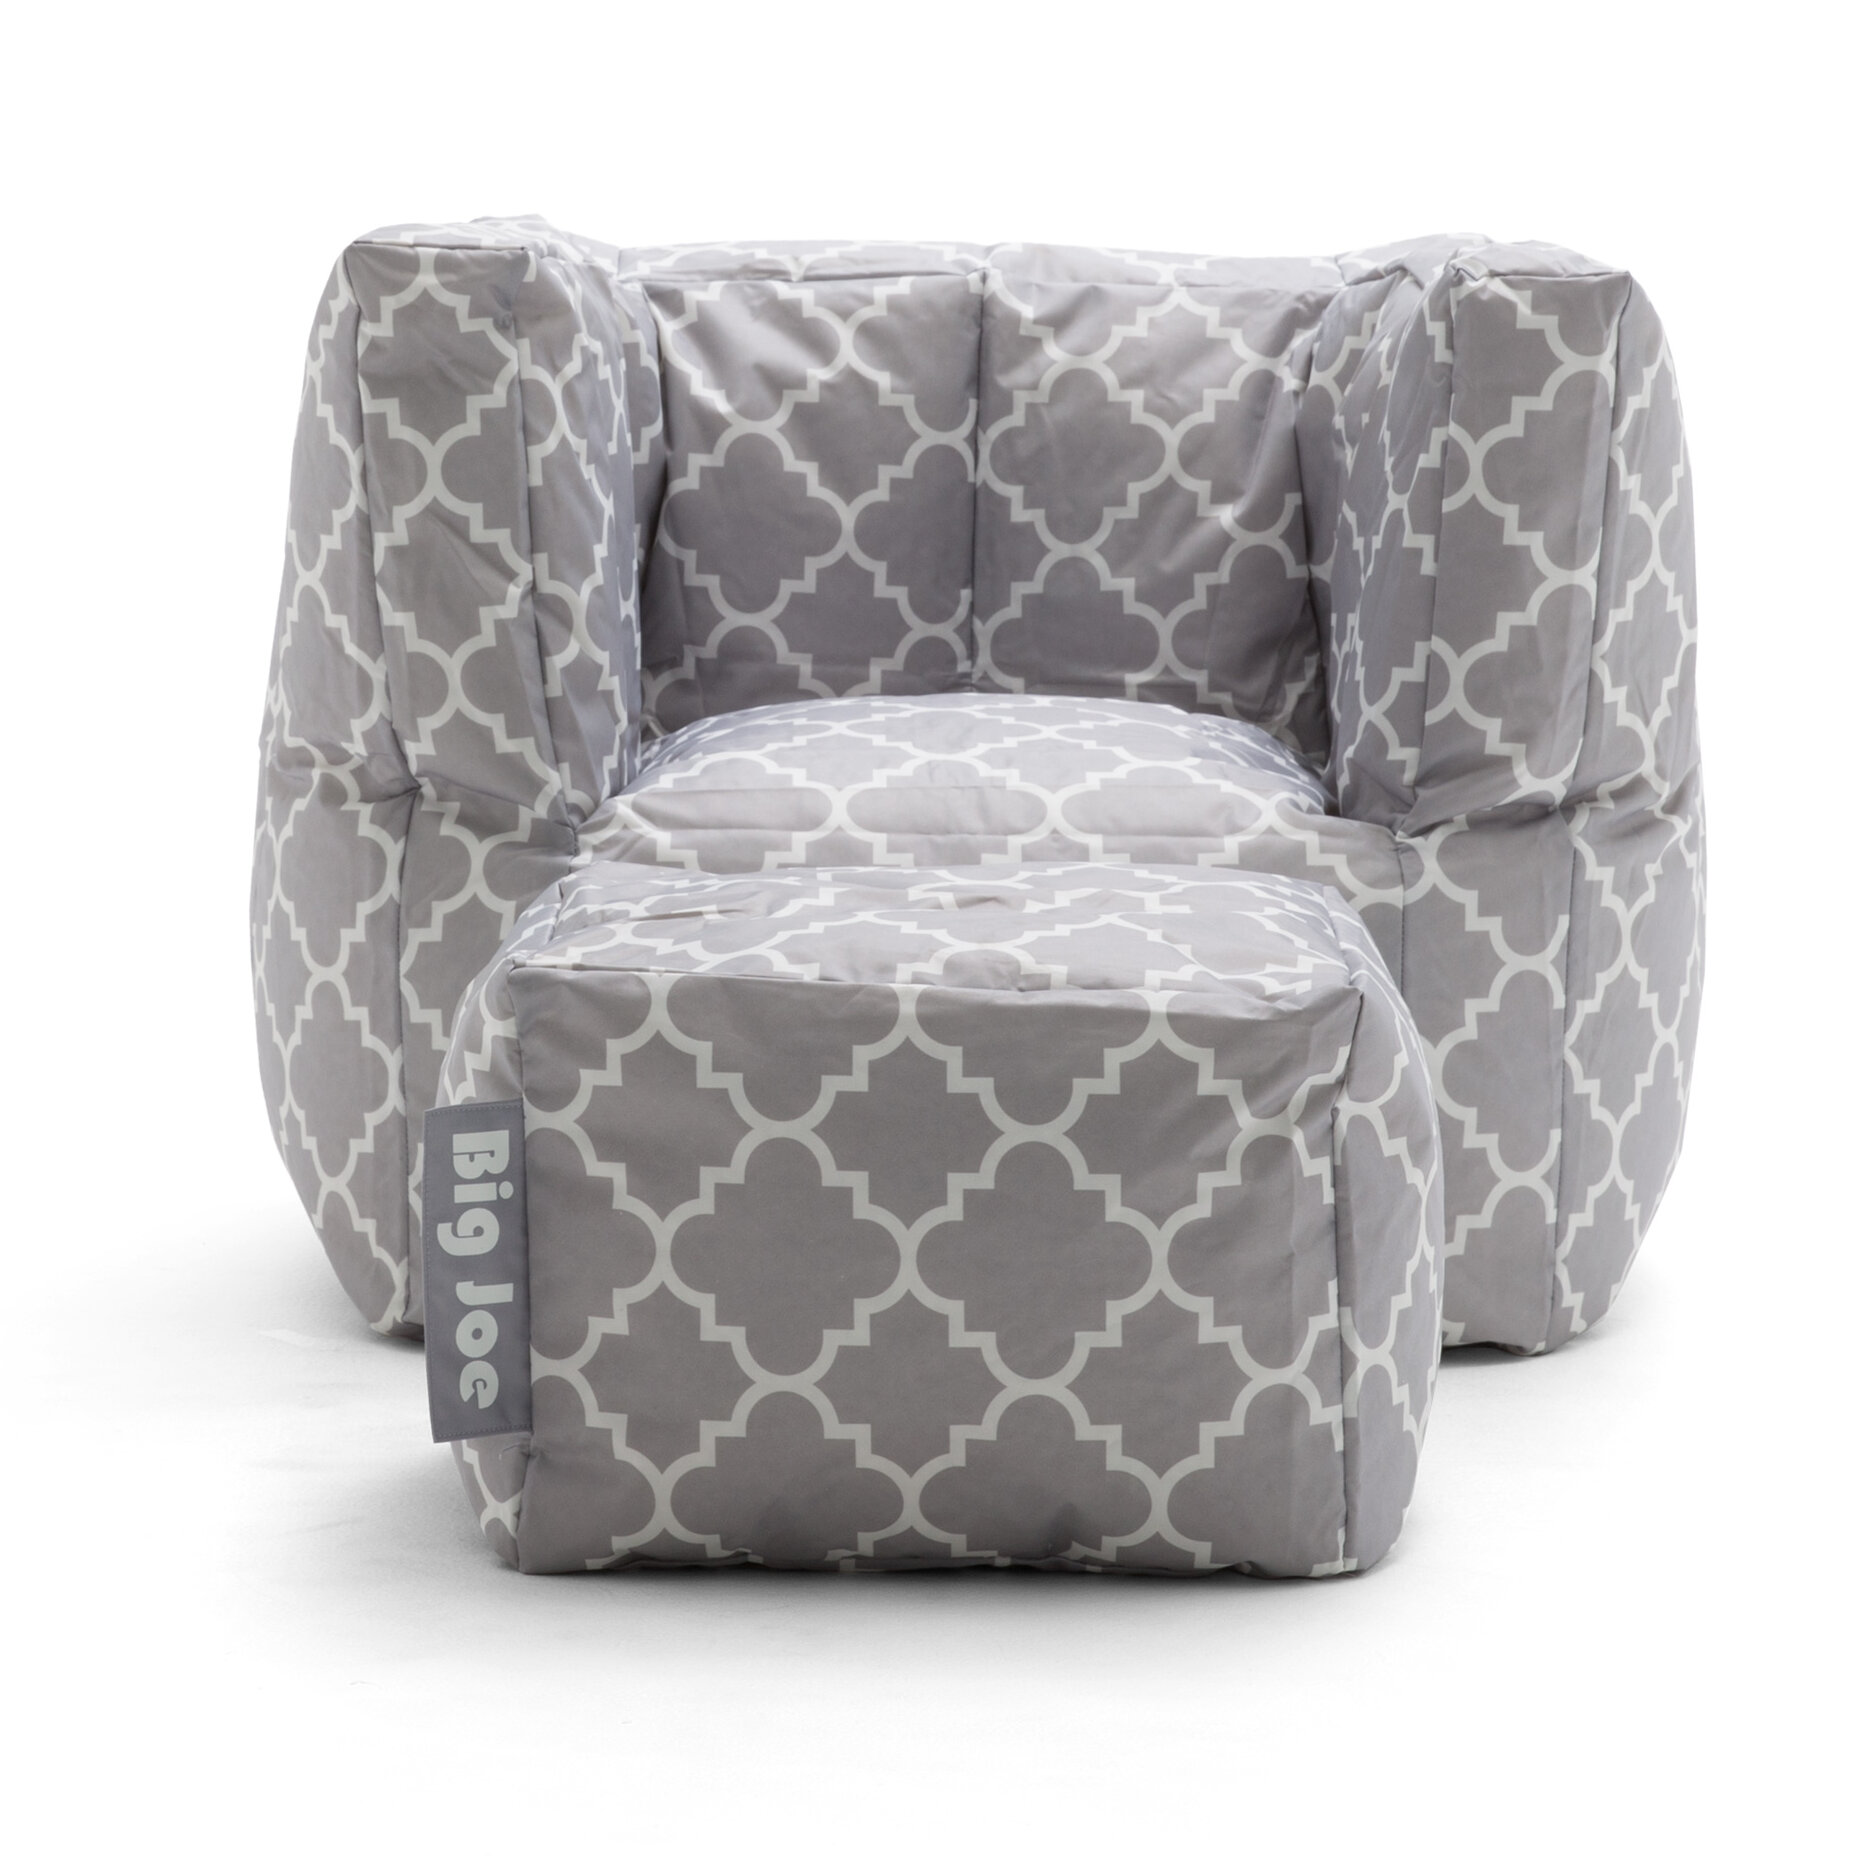 Phenomenal Comfort Research Big Joe Medium Bean Bag Set Reviews Wayfair Evergreenethics Interior Chair Design Evergreenethicsorg